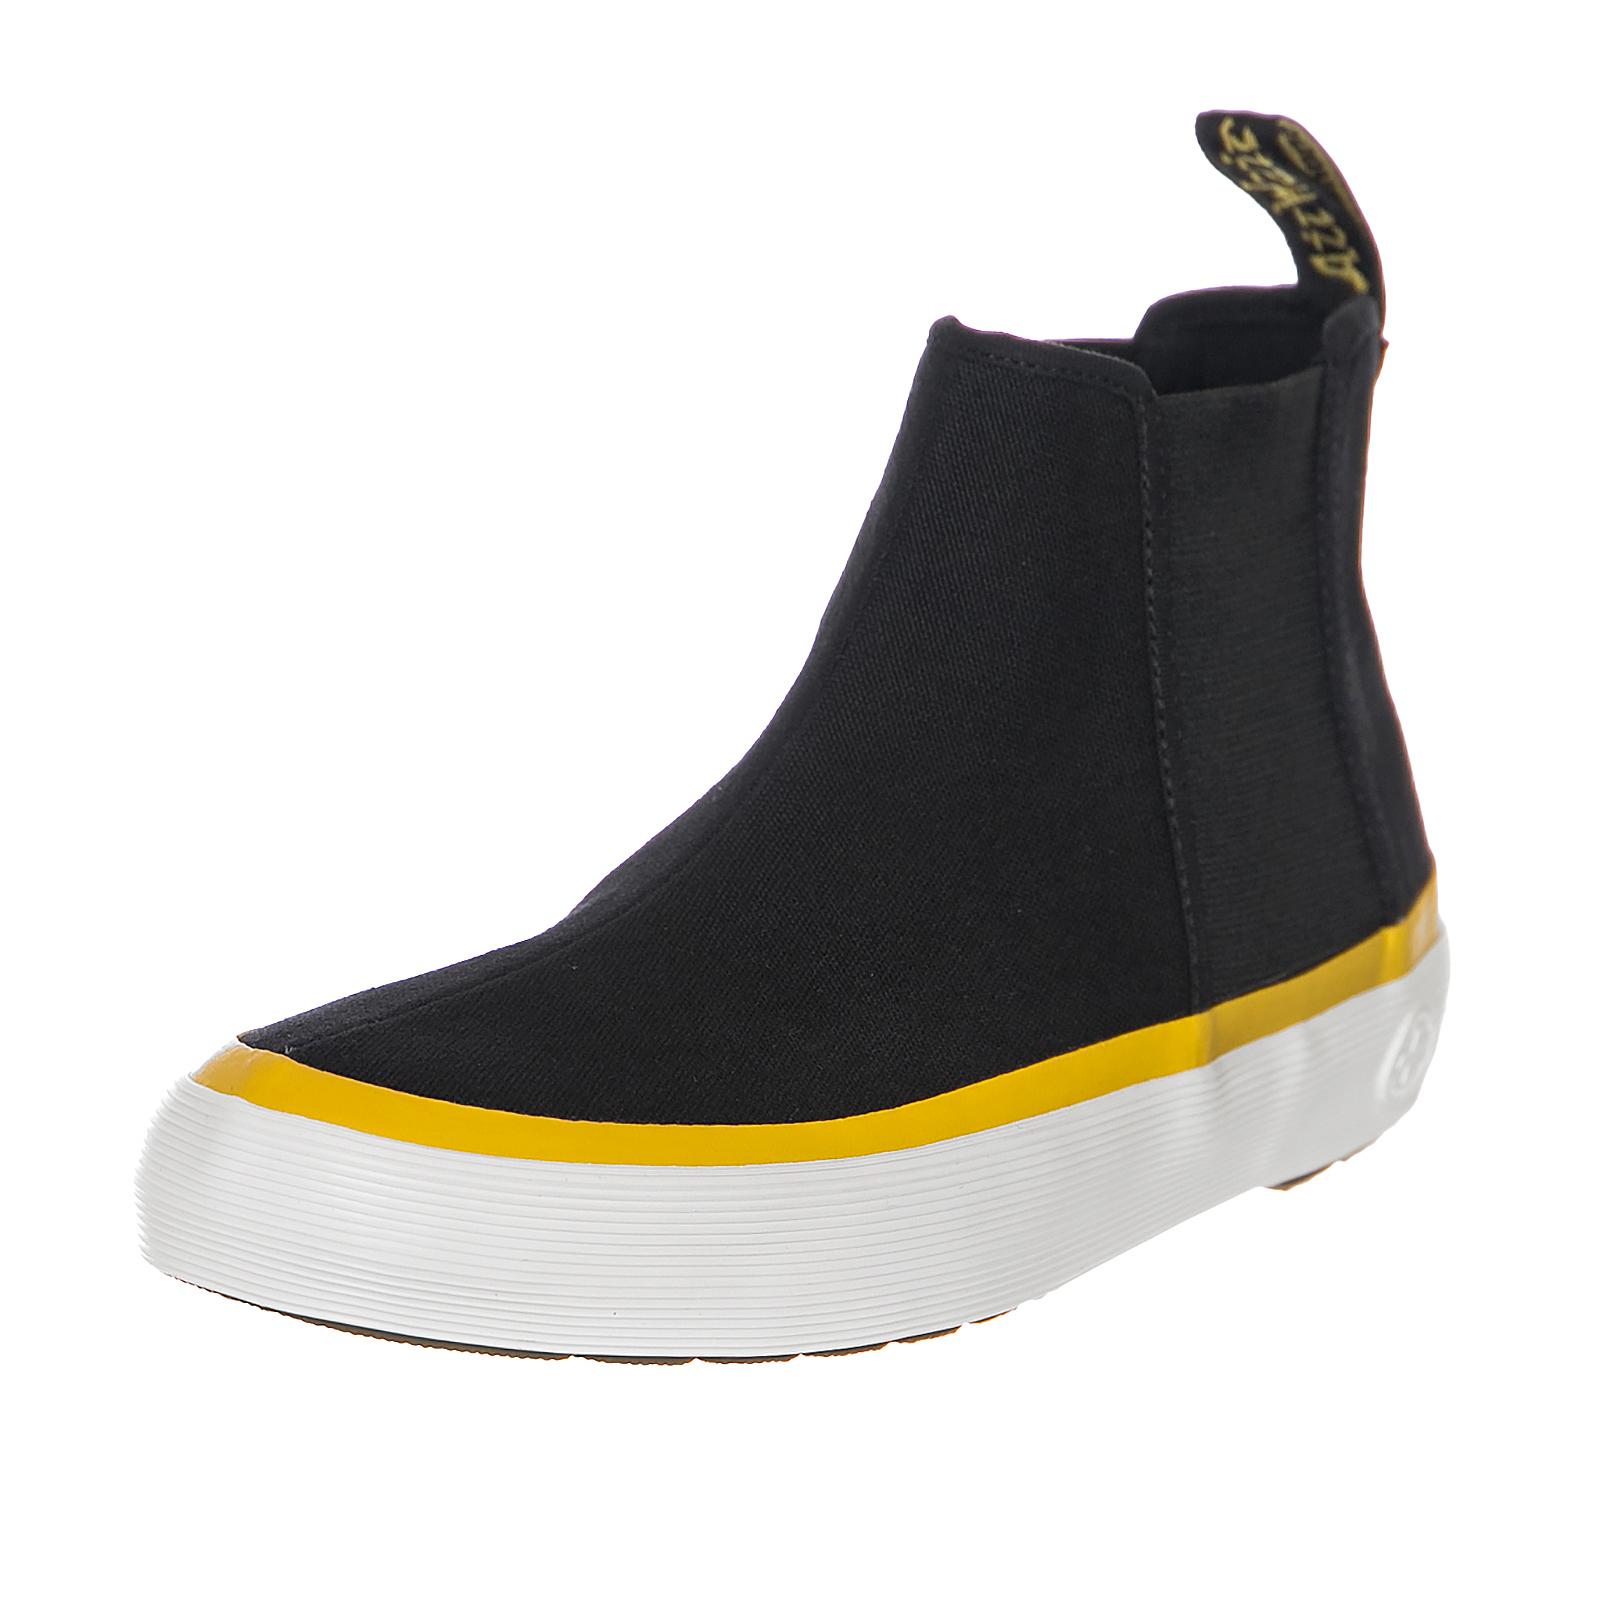 b446c3f3ecc Dr.Martens Sneakers Phoebe Black  Dark Red Canvas Black